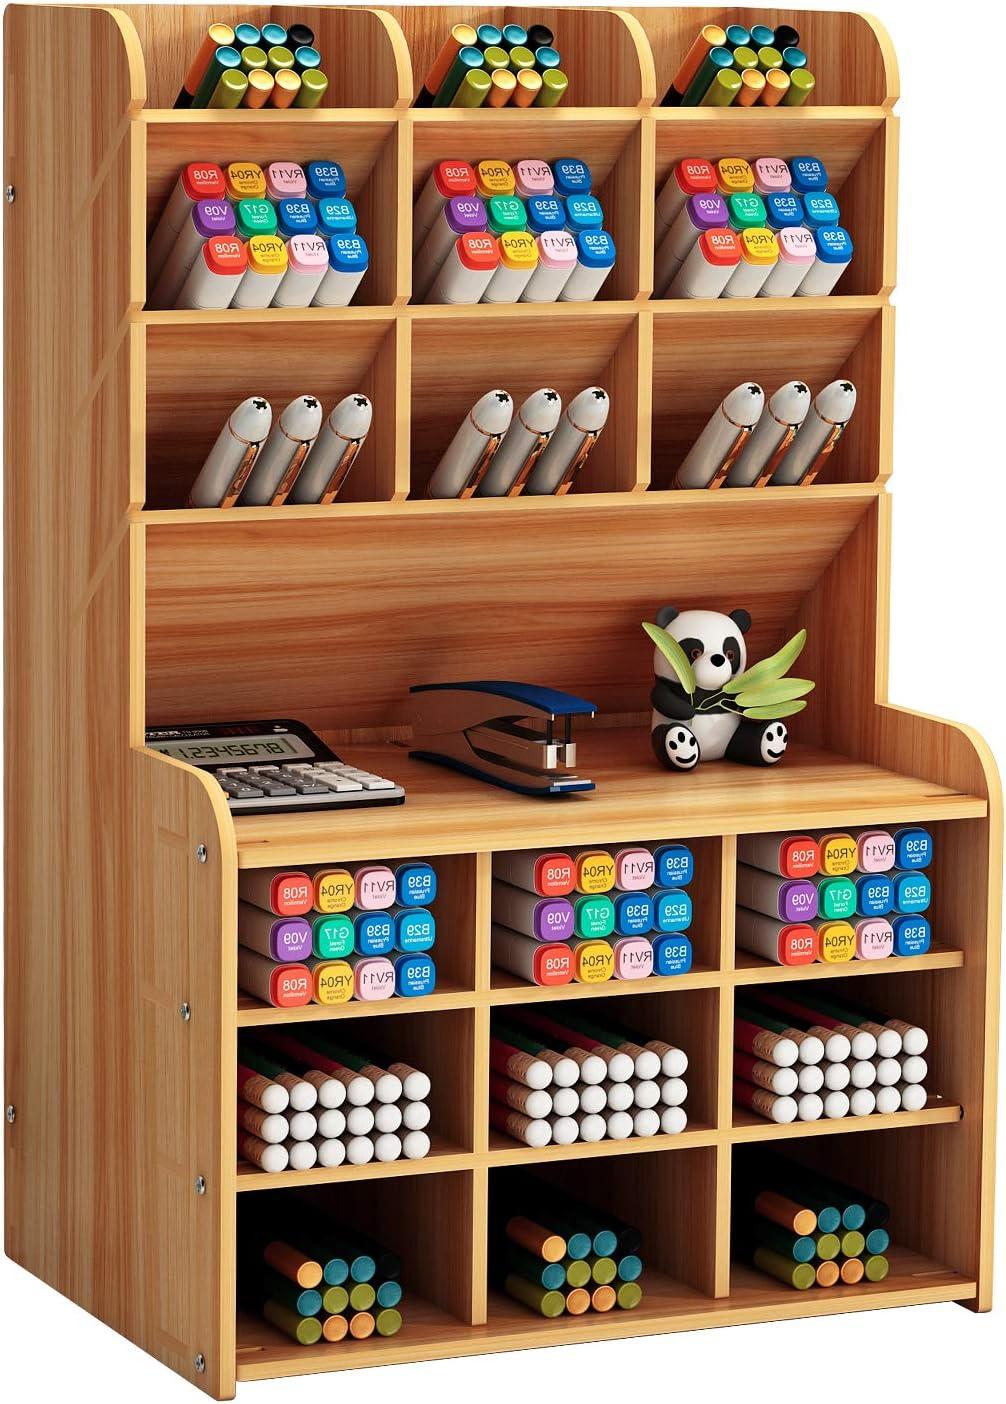 Marbrasse Upgraded Wooden Pencil Holder Desk Pen Ranking TOP11 Columbus Mall for Organizer